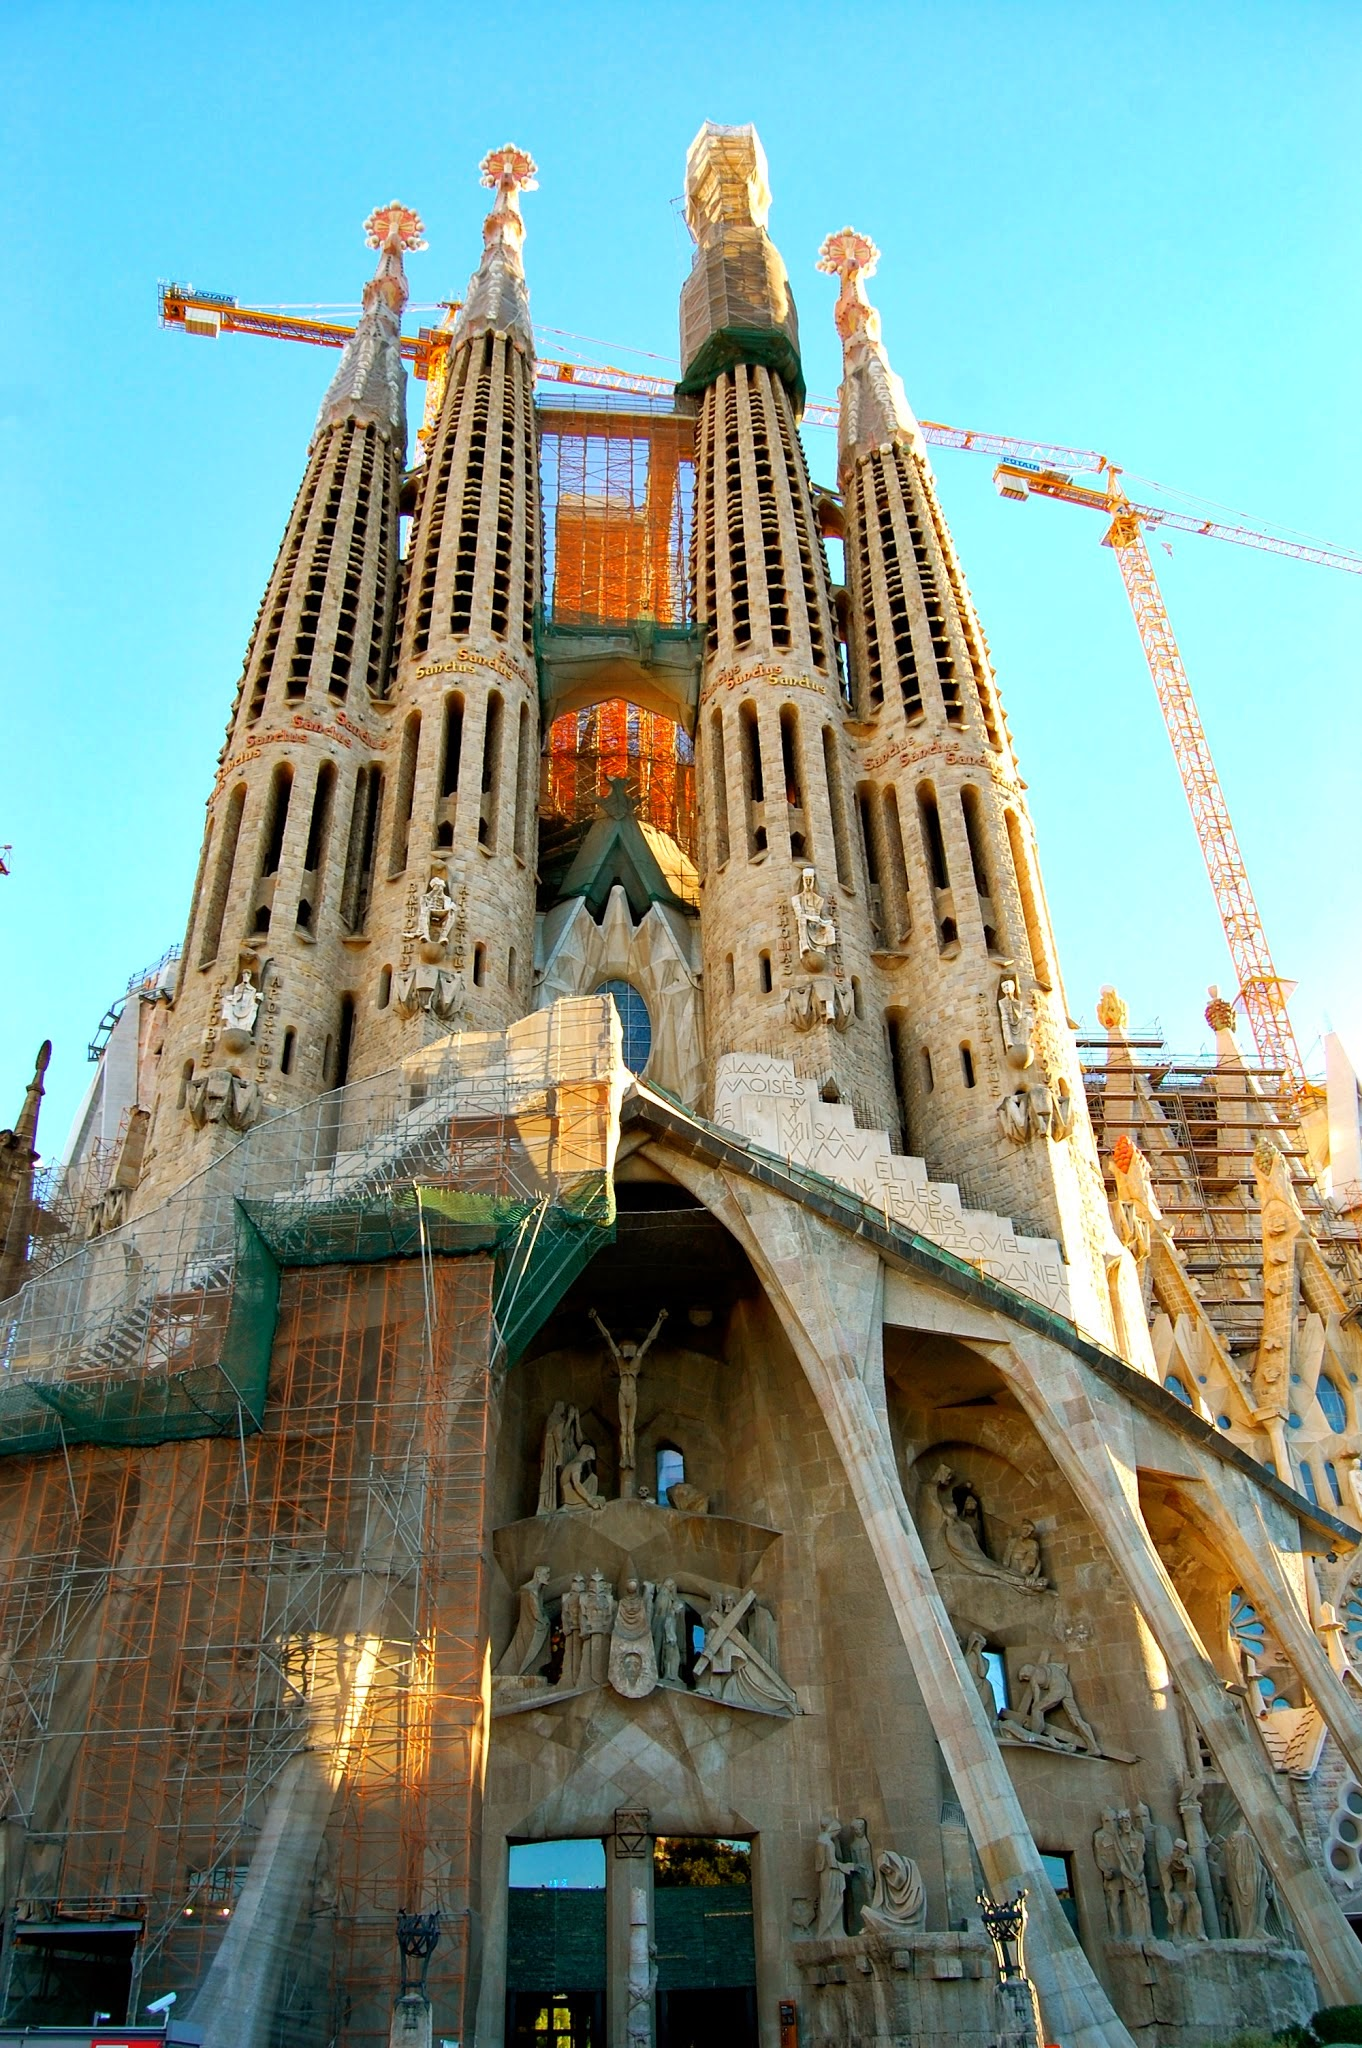 Sagrada Familia: Coloring Without Borders: Sagrada Família